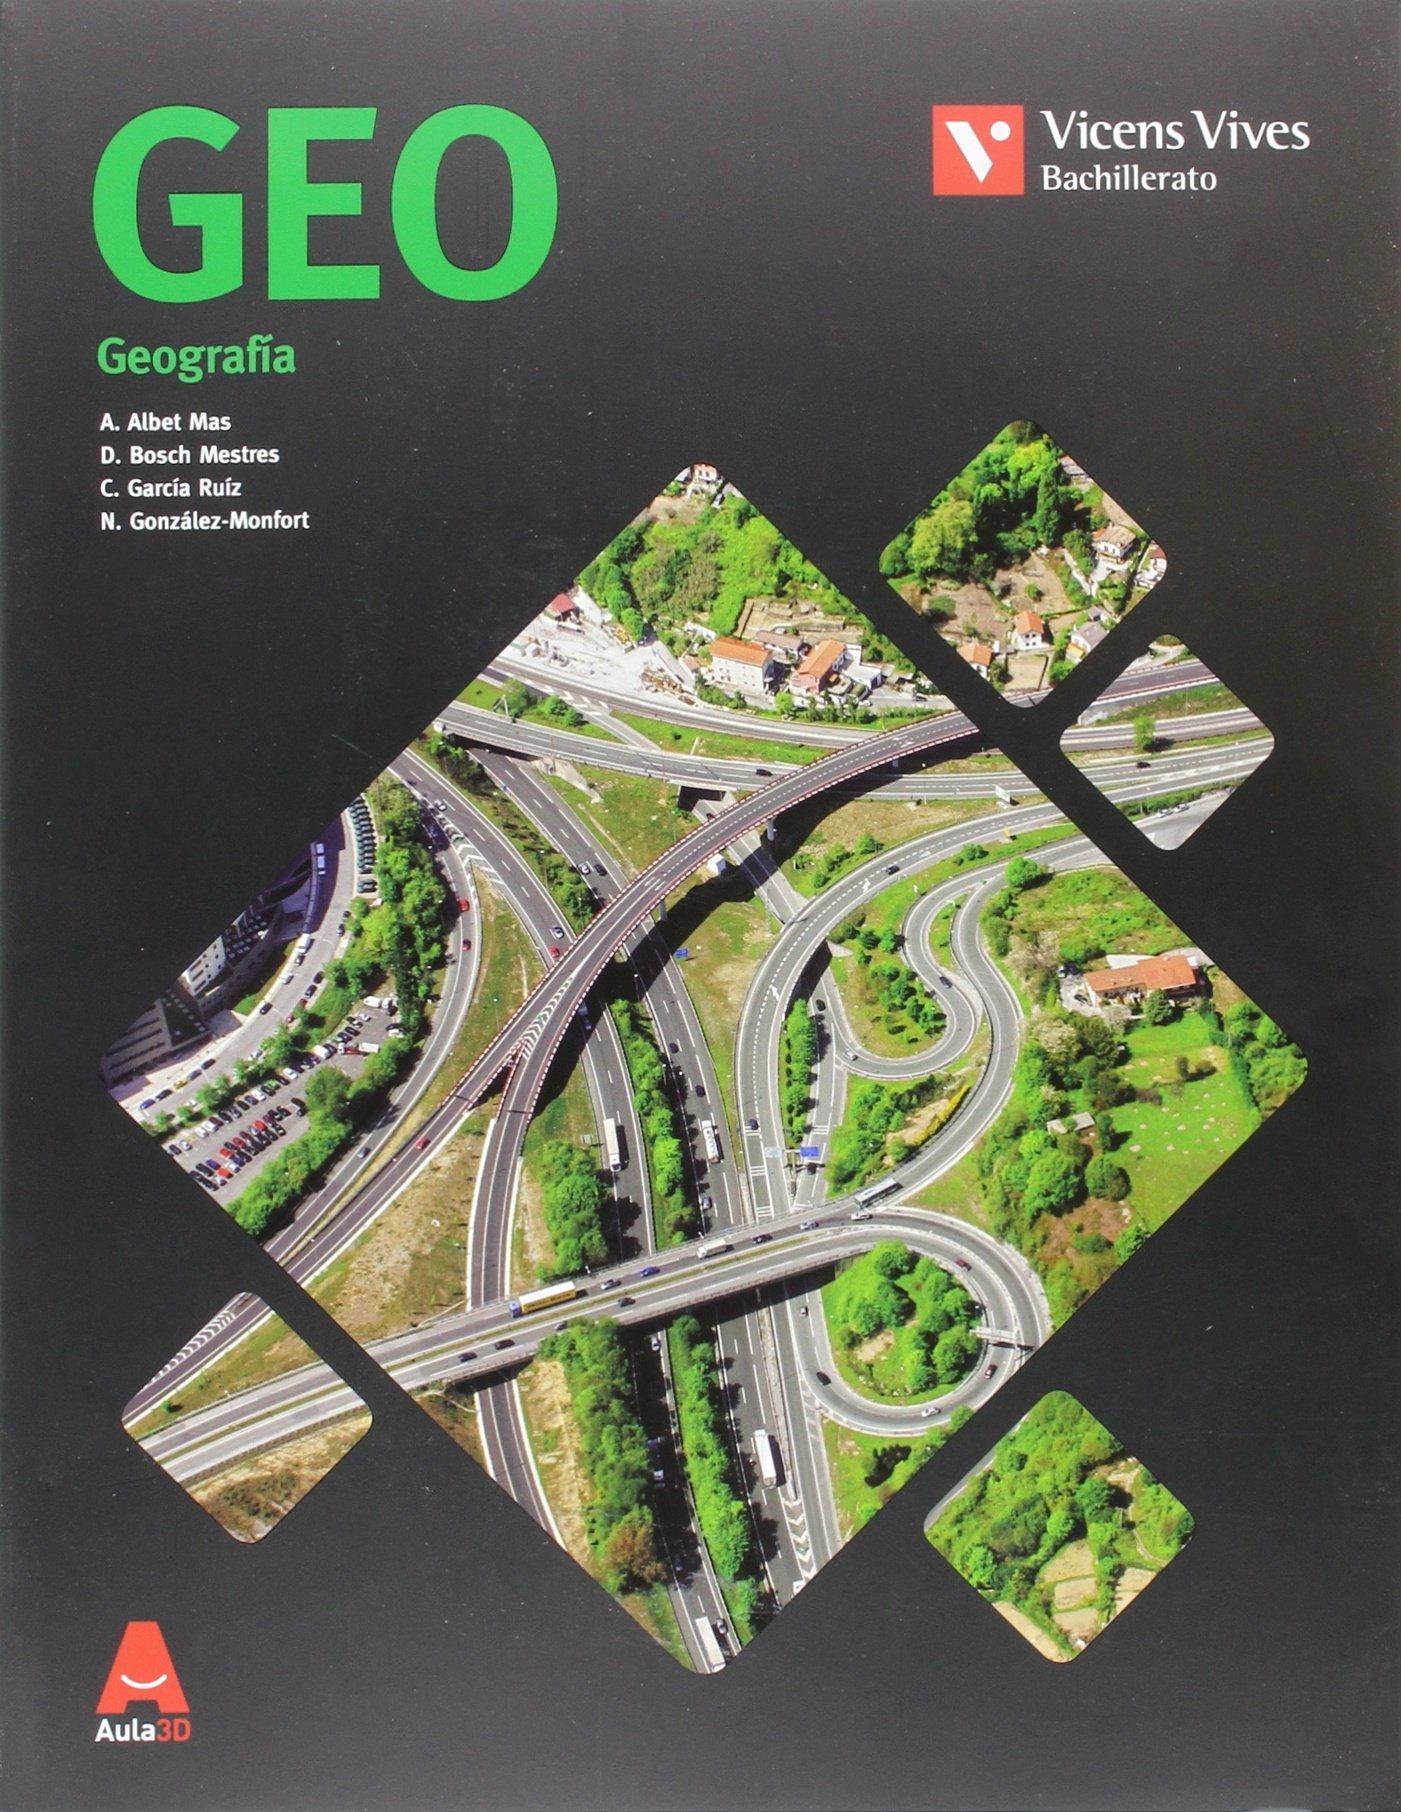 GEO (BACHILLERATO) AULA 3D: 000001 - 9788468235837: Amazon.es: Albet Mas, Abel, Bosch Mestres, Dolors, Garcia Ruiz, Carles, Gonzalez Monfort, Neus: Libros